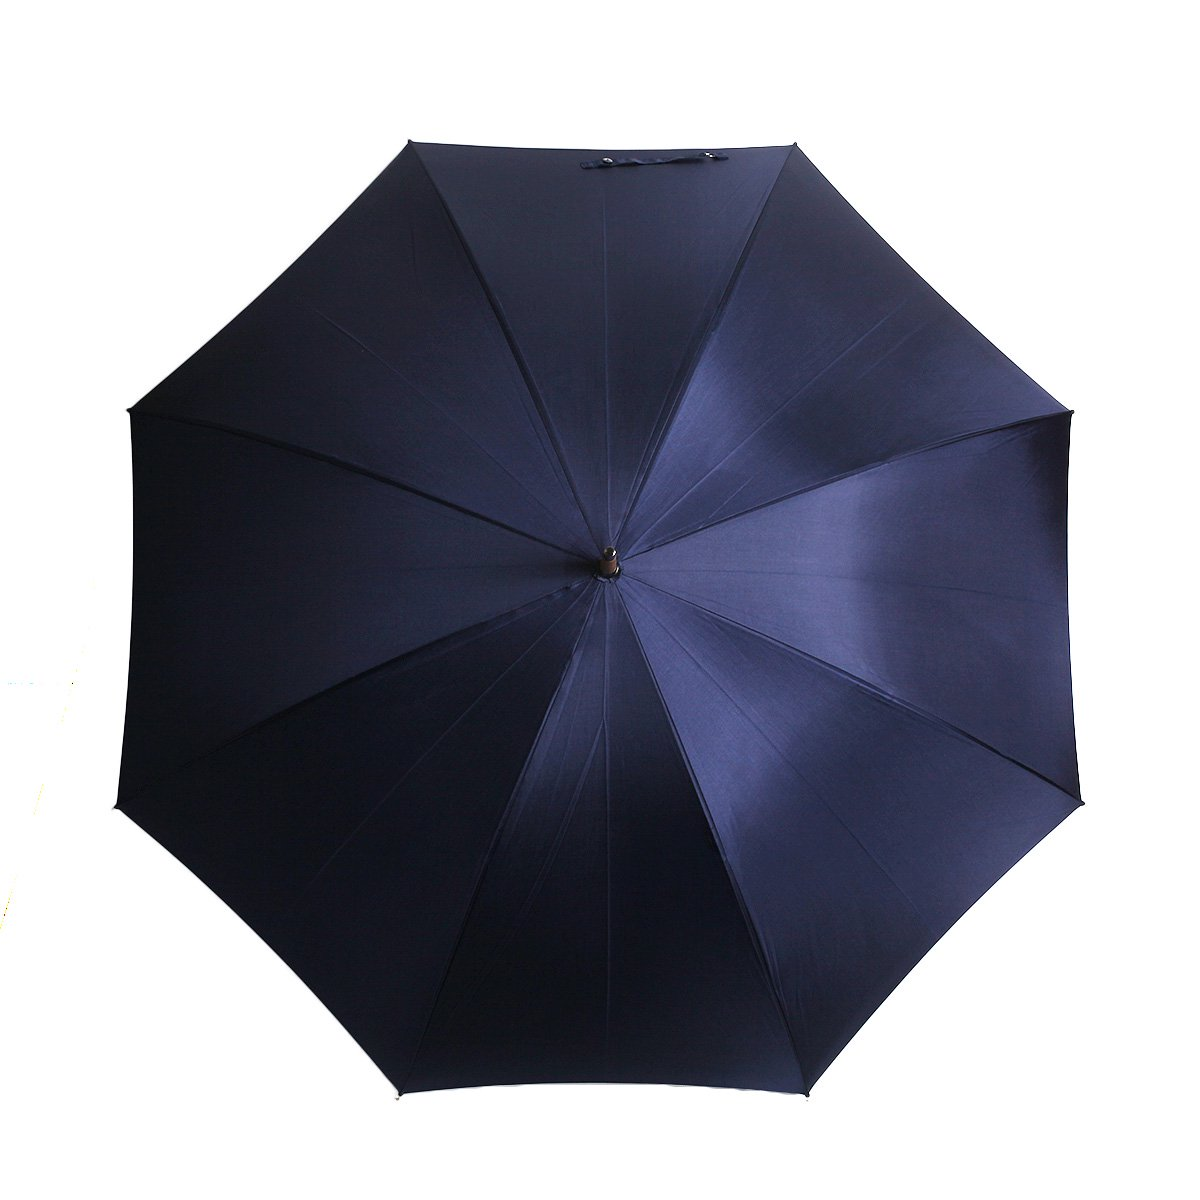 【10%OFF】【公式限定】富士絹 細巻き 長傘(アイアンウッド) 詳細画像7